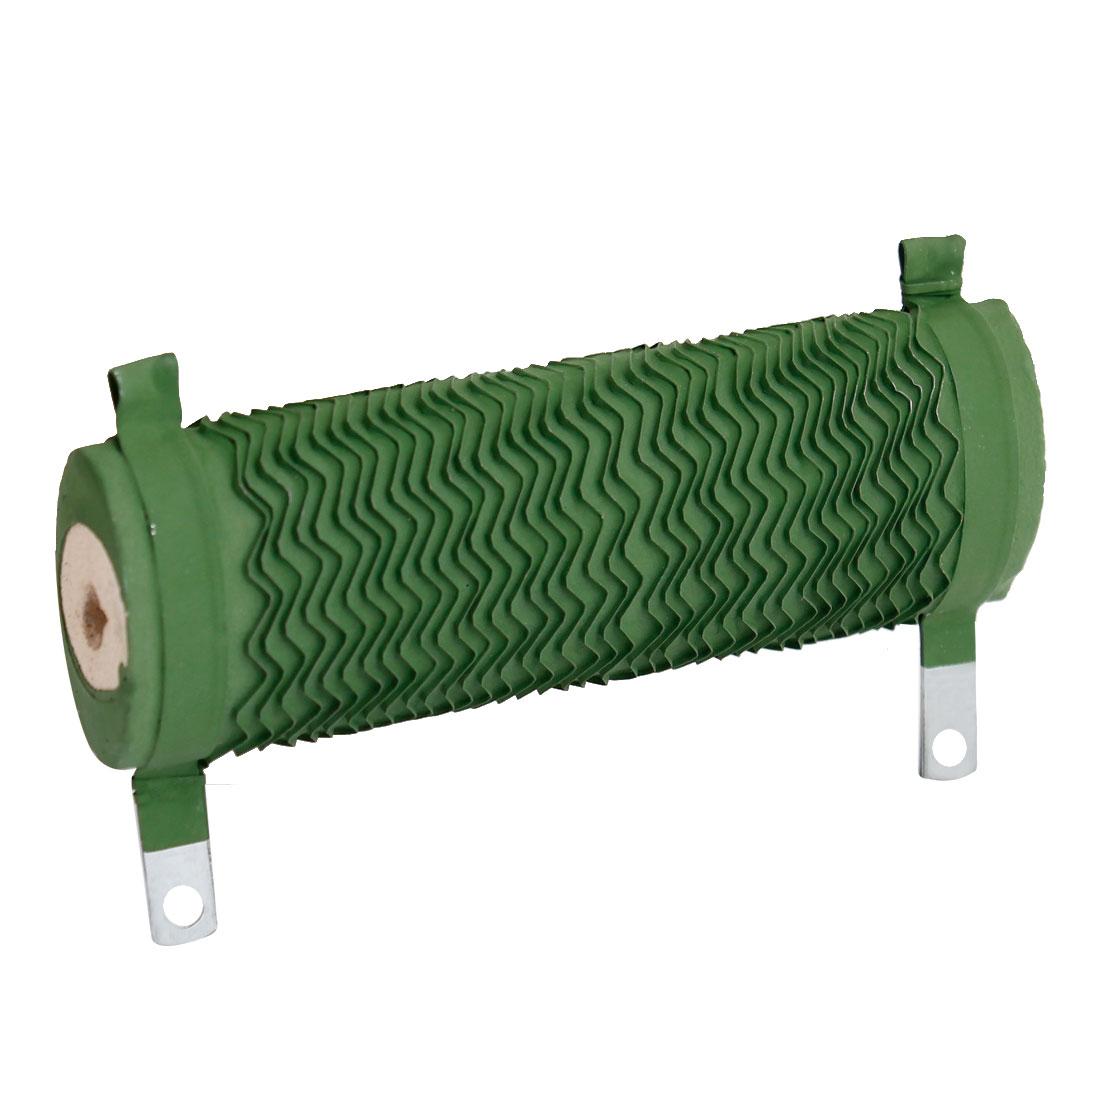 10 Ohm 150W Wirewound Green Ceramic Case Tube Power Resistor